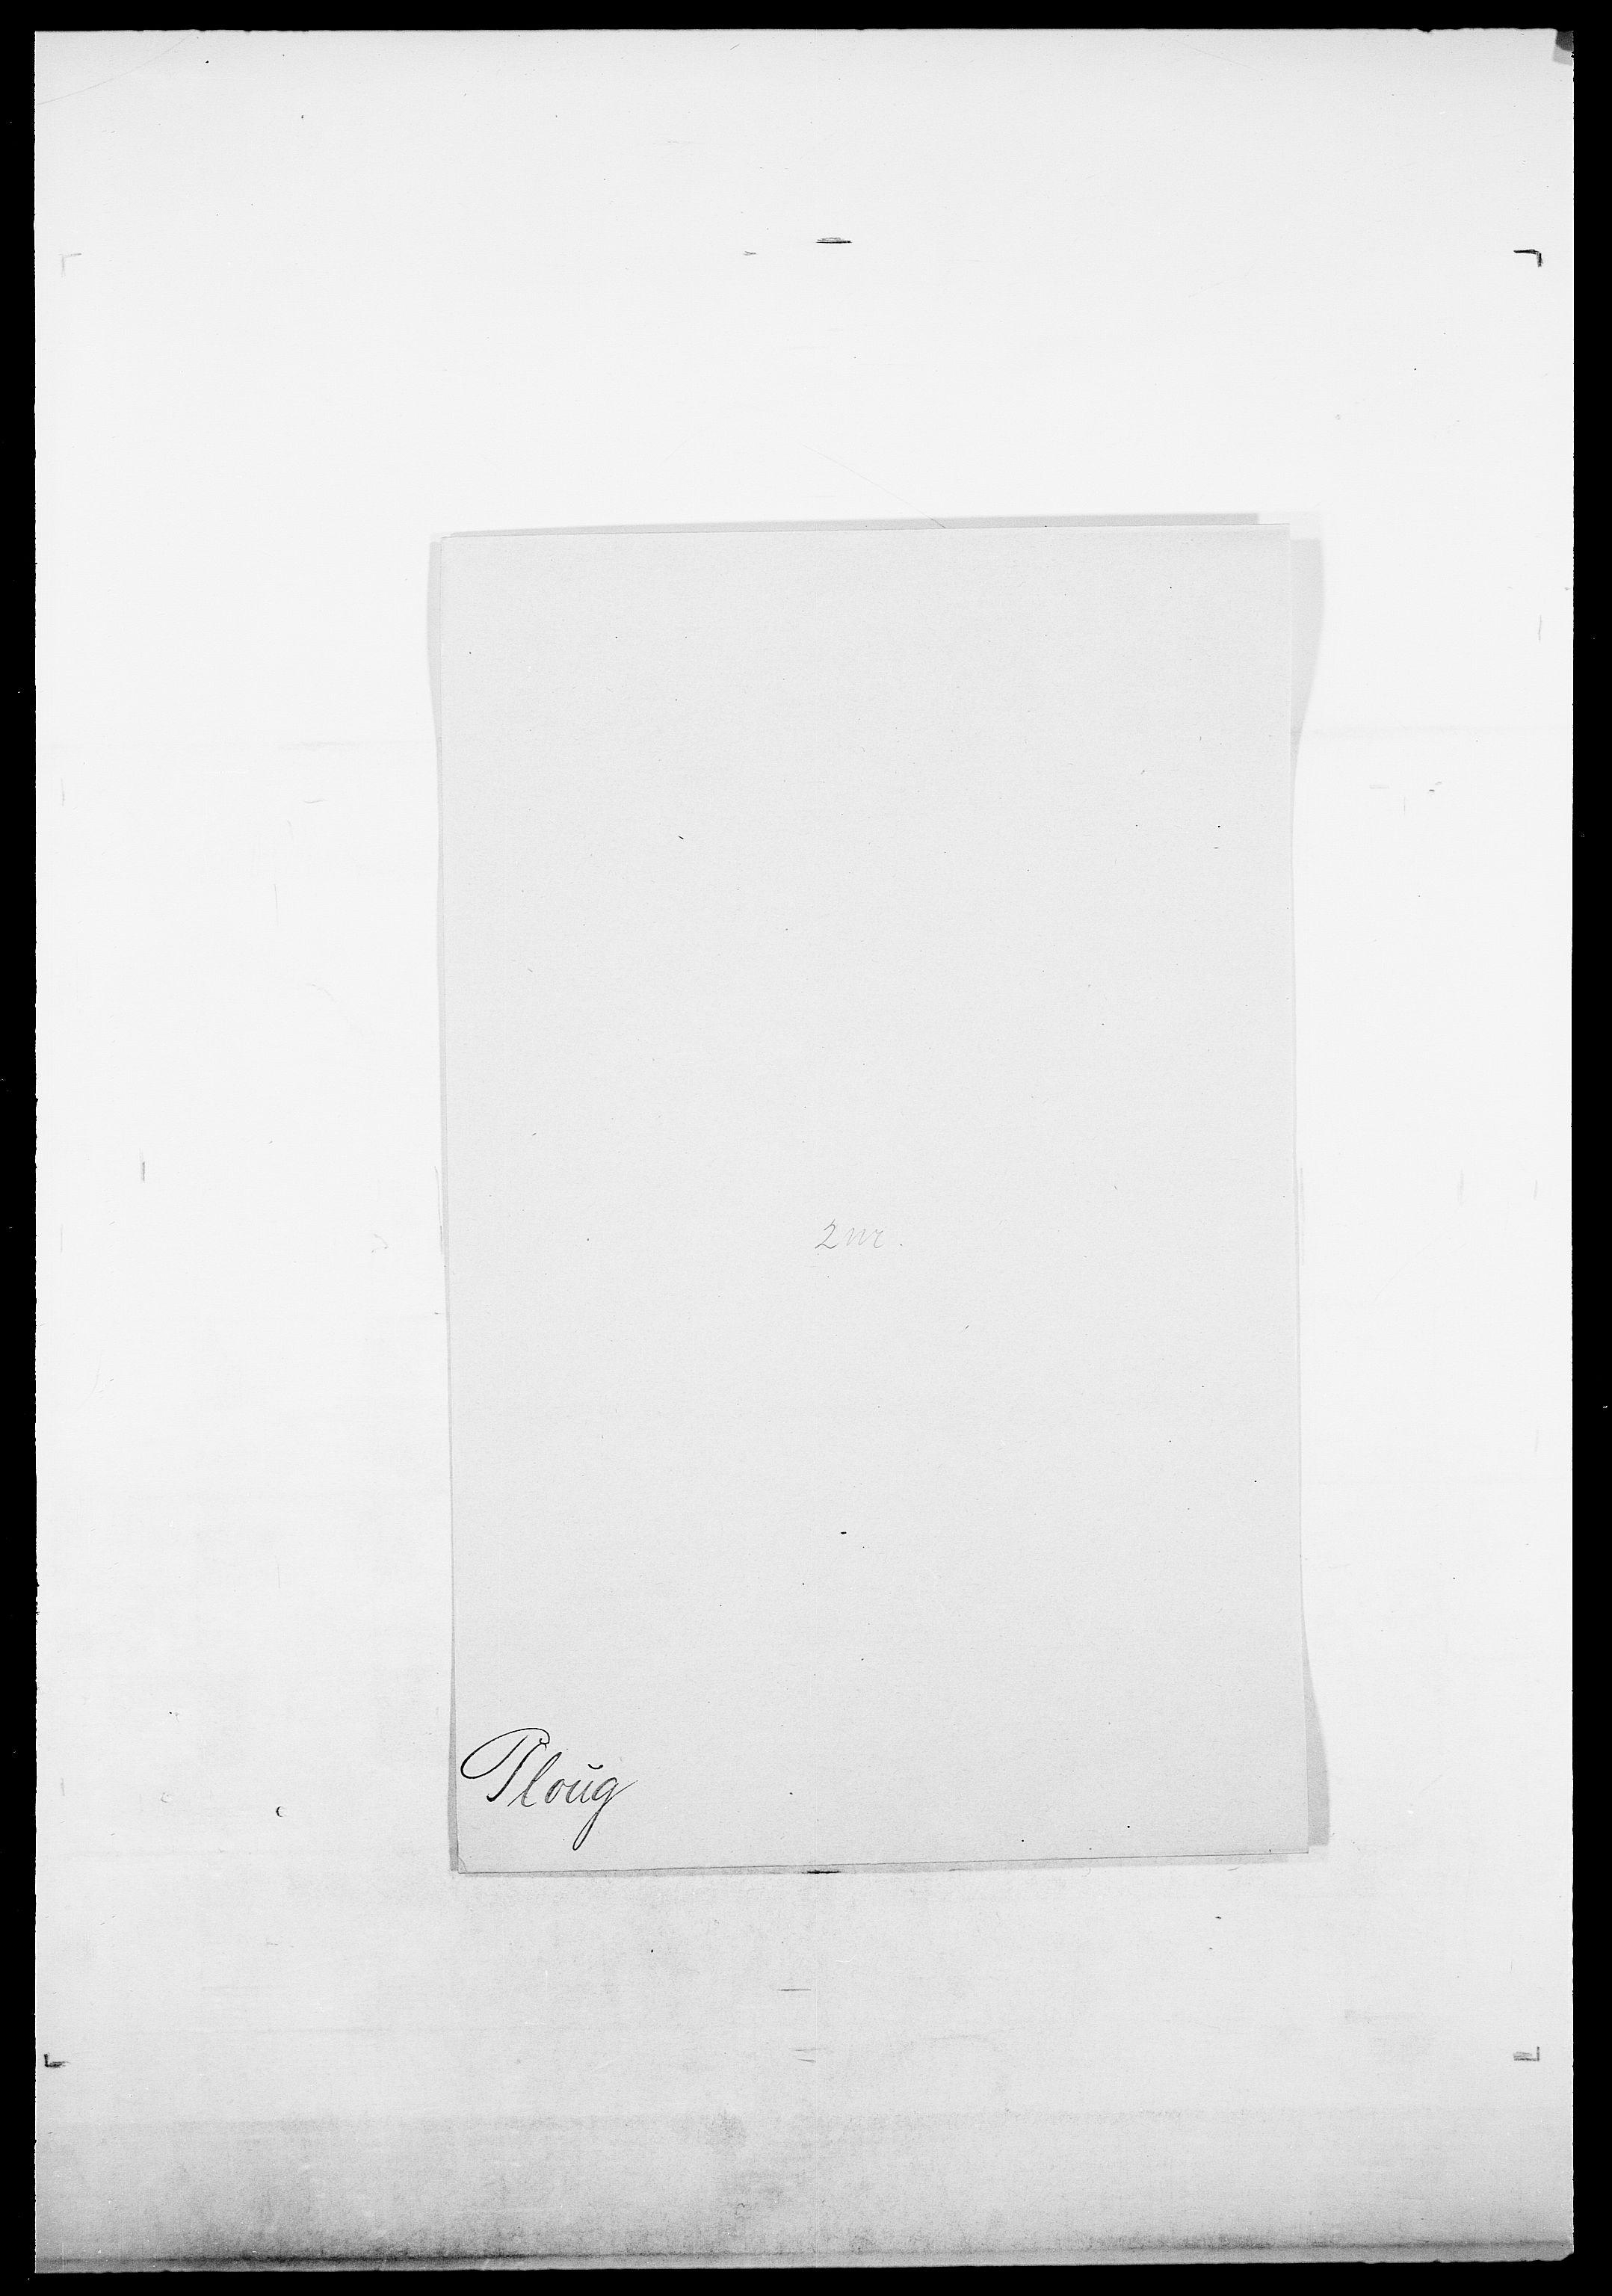 SAO, Delgobe, Charles Antoine - samling, D/Da/L0031: de Place - Raaum, s. 131